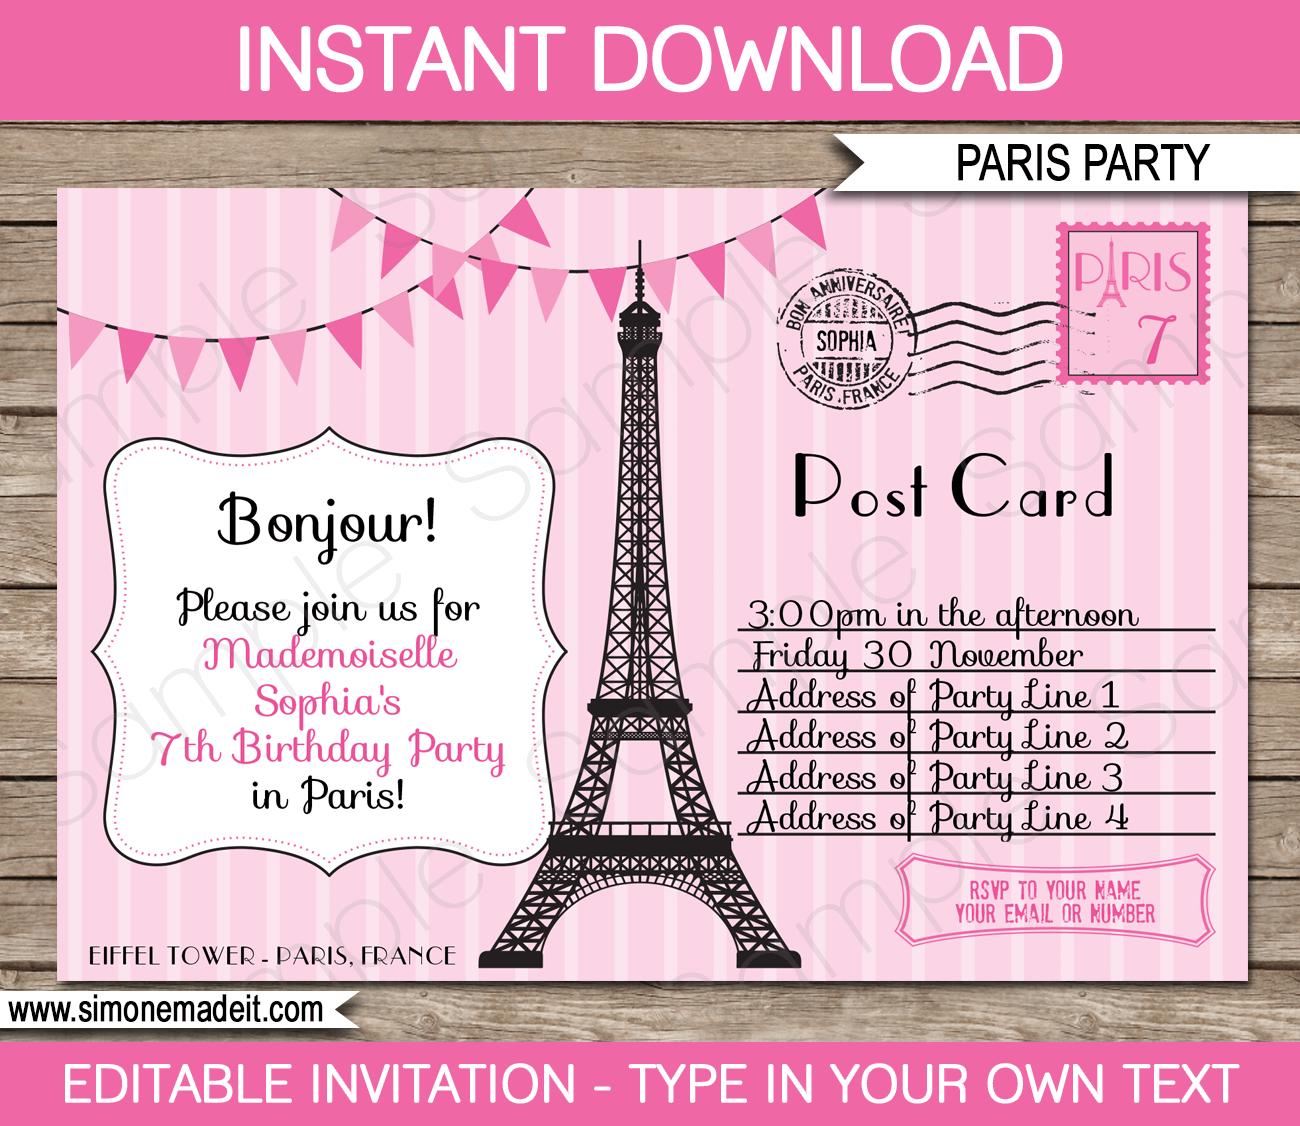 Paris Party Invitations Template